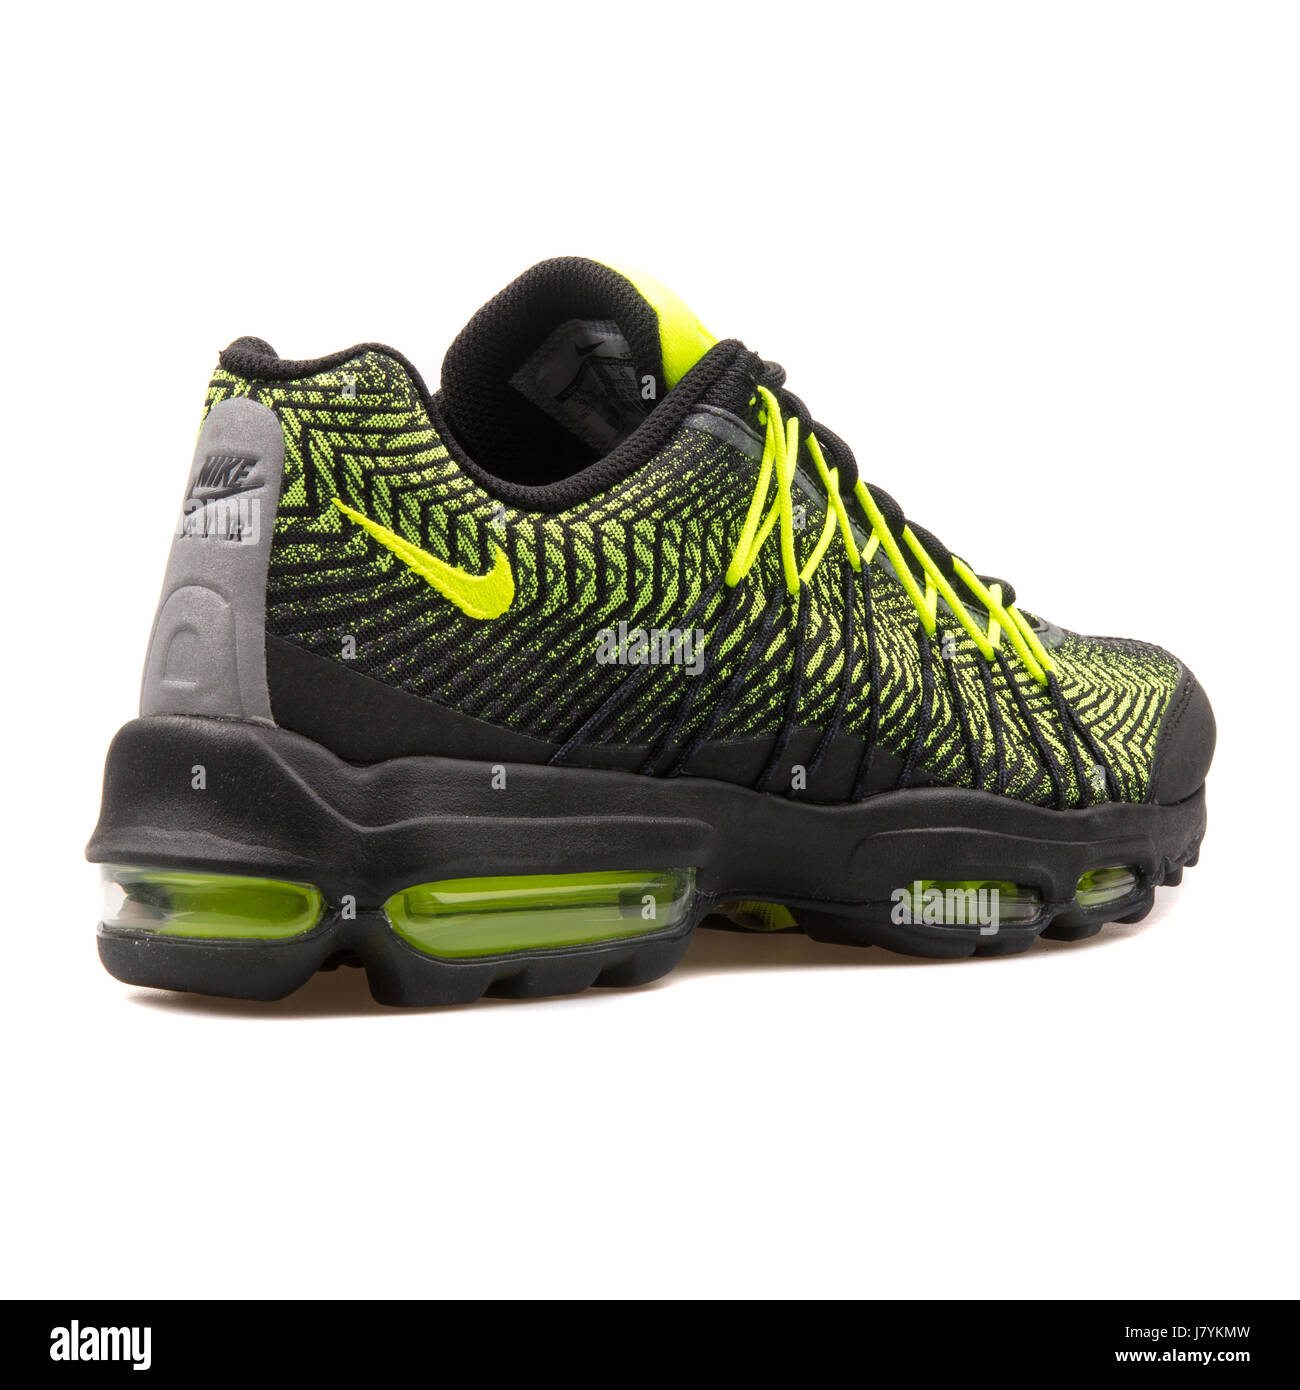 grand choix de 220b4 732c7 Nike Air Max 95 Ultra JCRD Men's Running Sneakers - 749771 ...